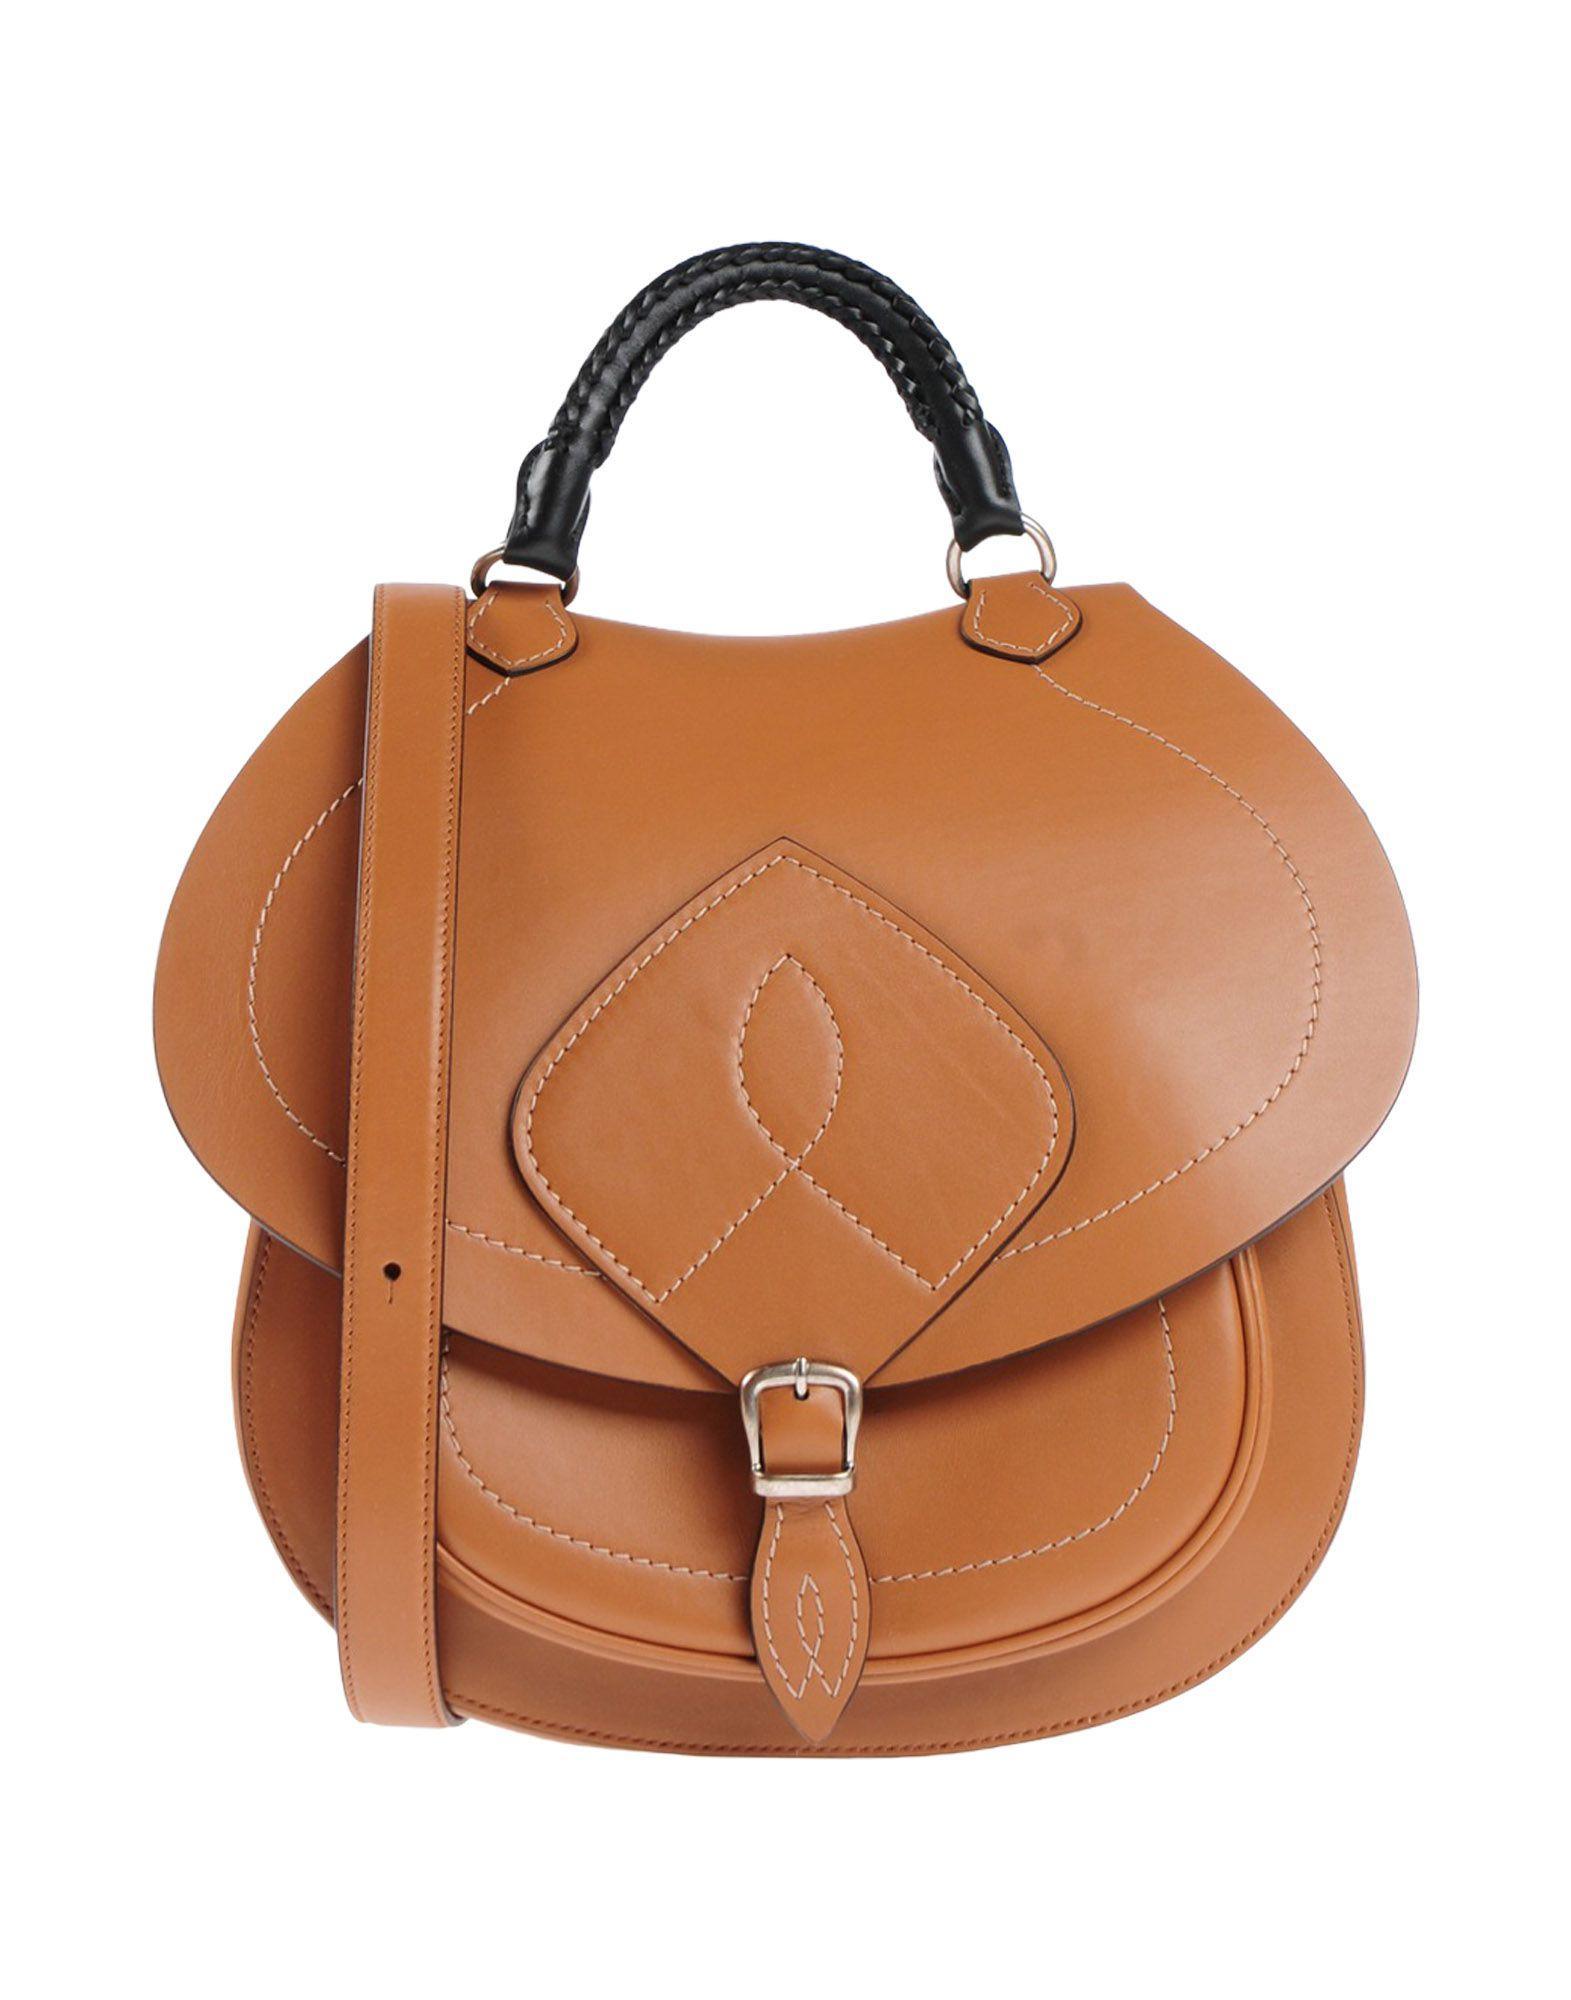 Maison Margiela Handbag In Brown